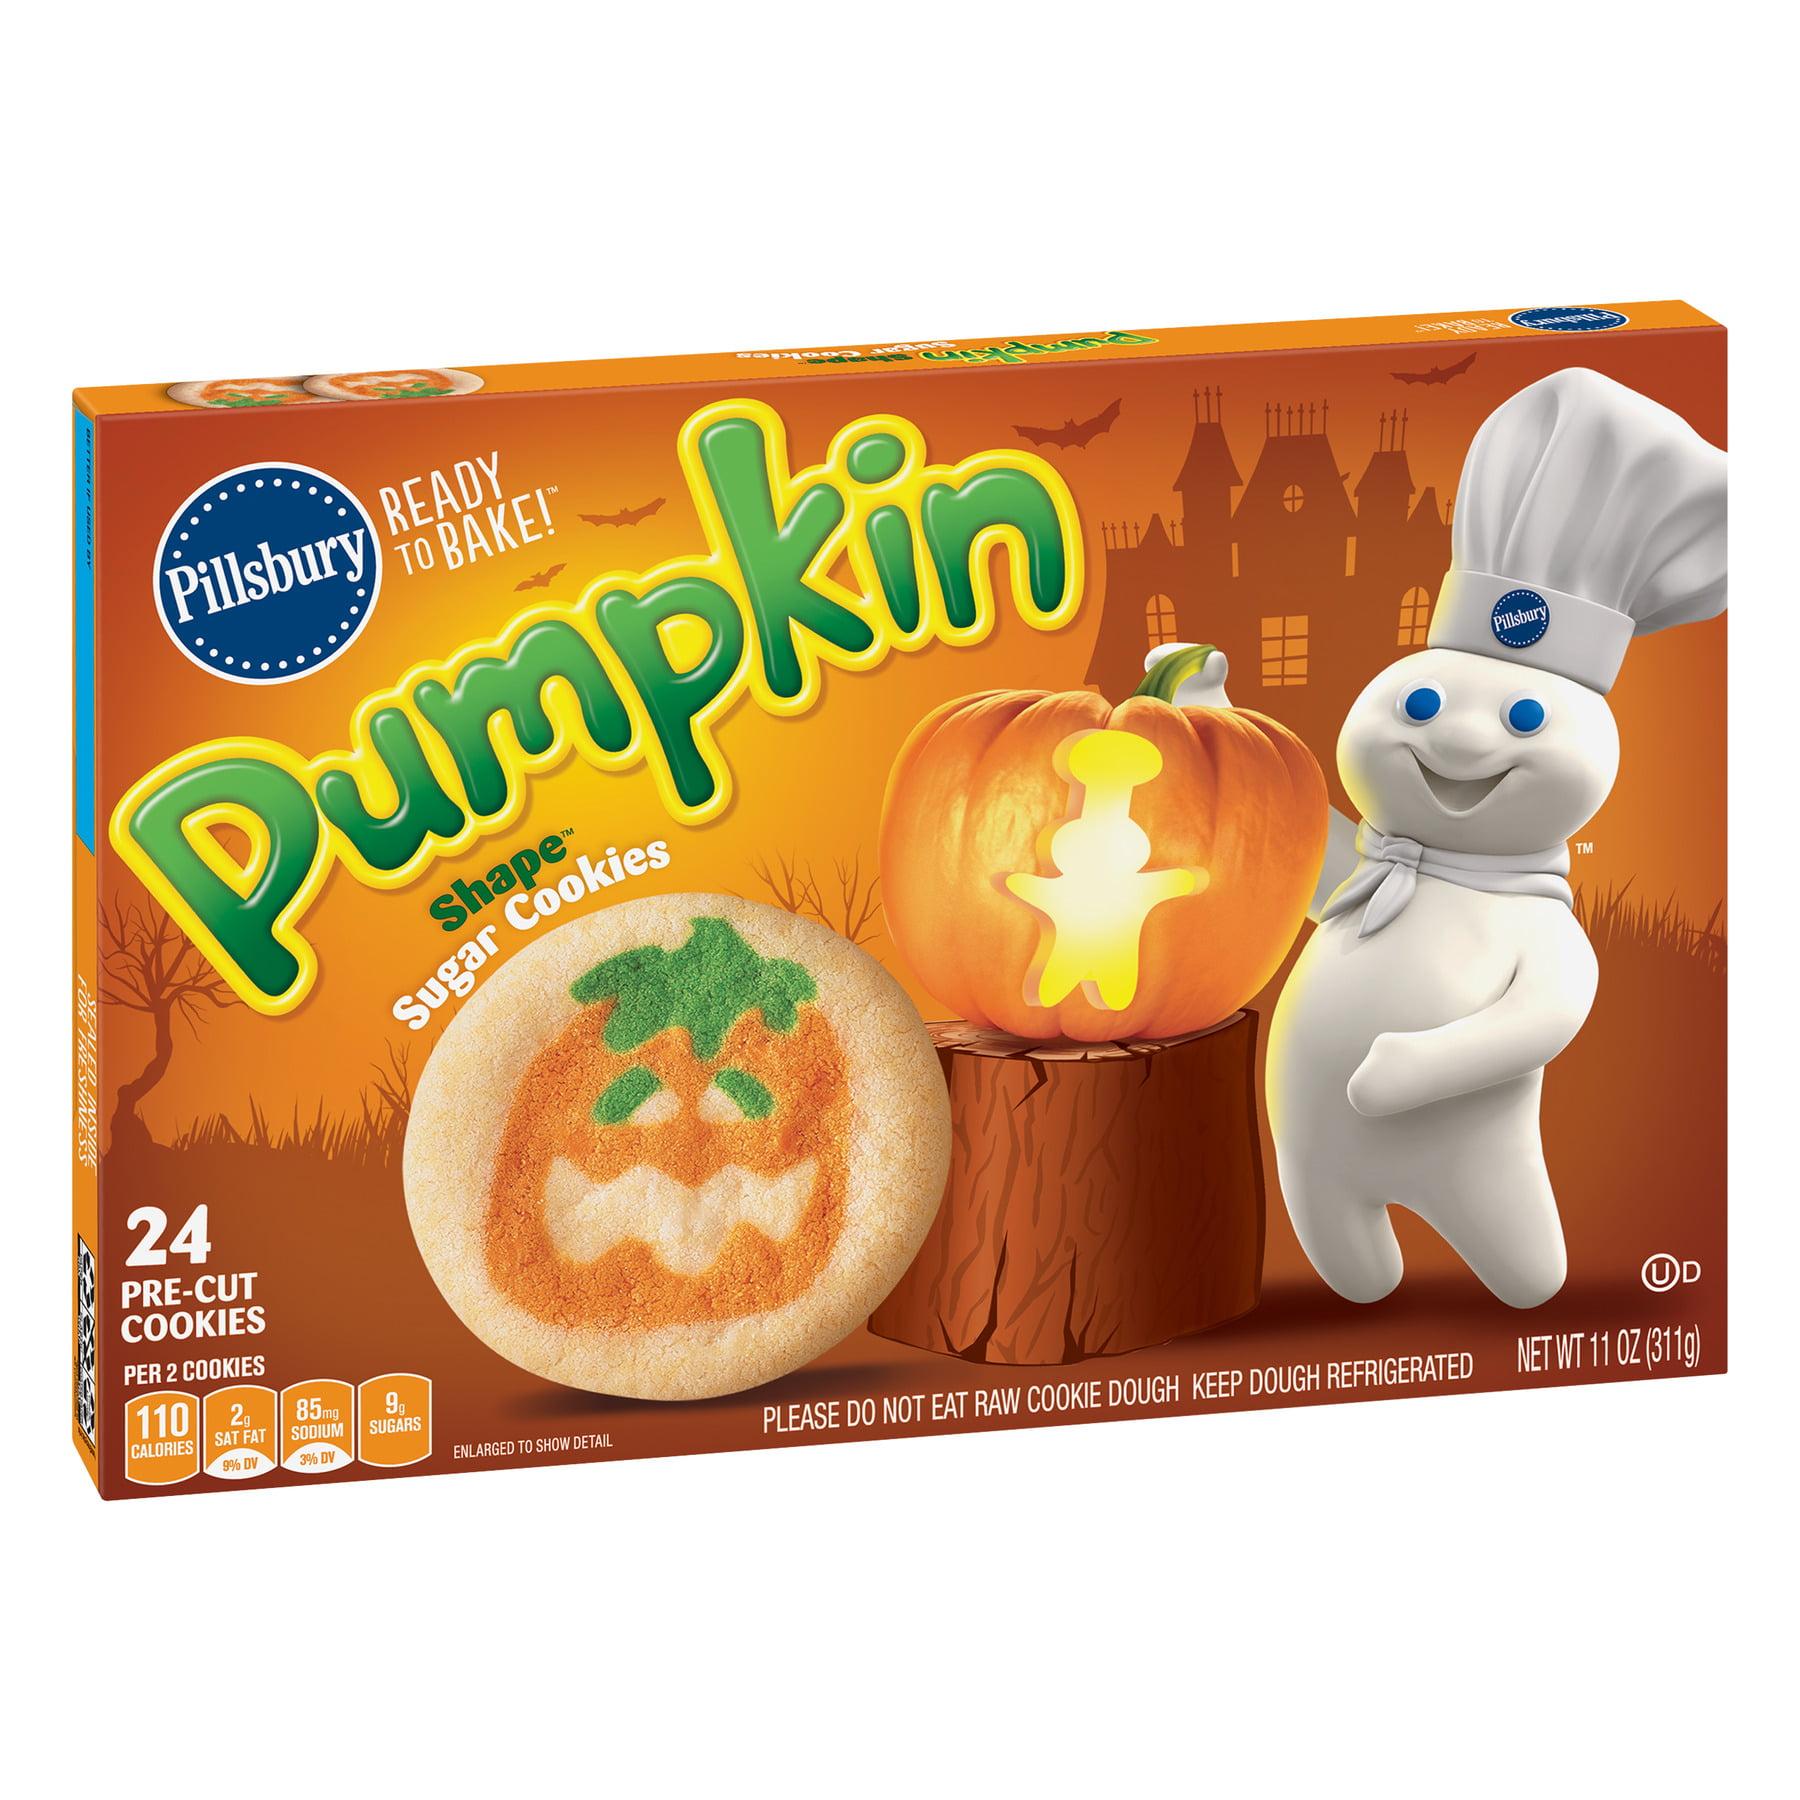 pillsbury ready to bake!™ pumpkin shape™ sugar cookies - walmart